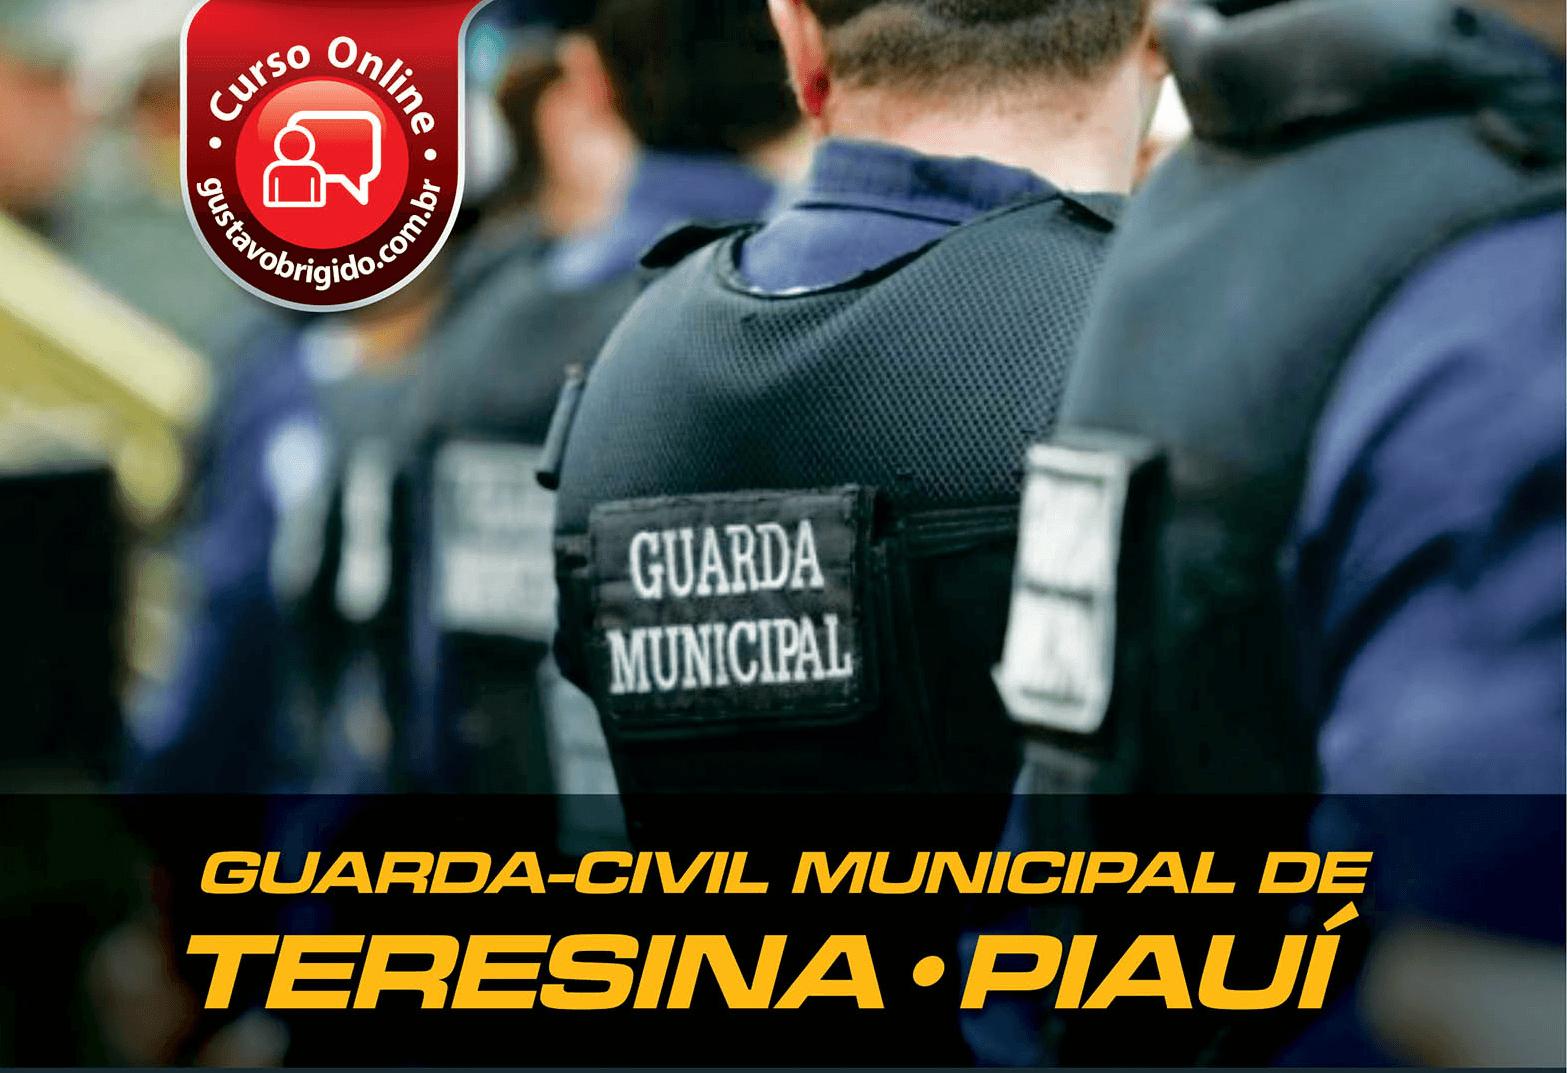 CURSO GUARDA-CIVIL MUNICIPAL DE TERESINA